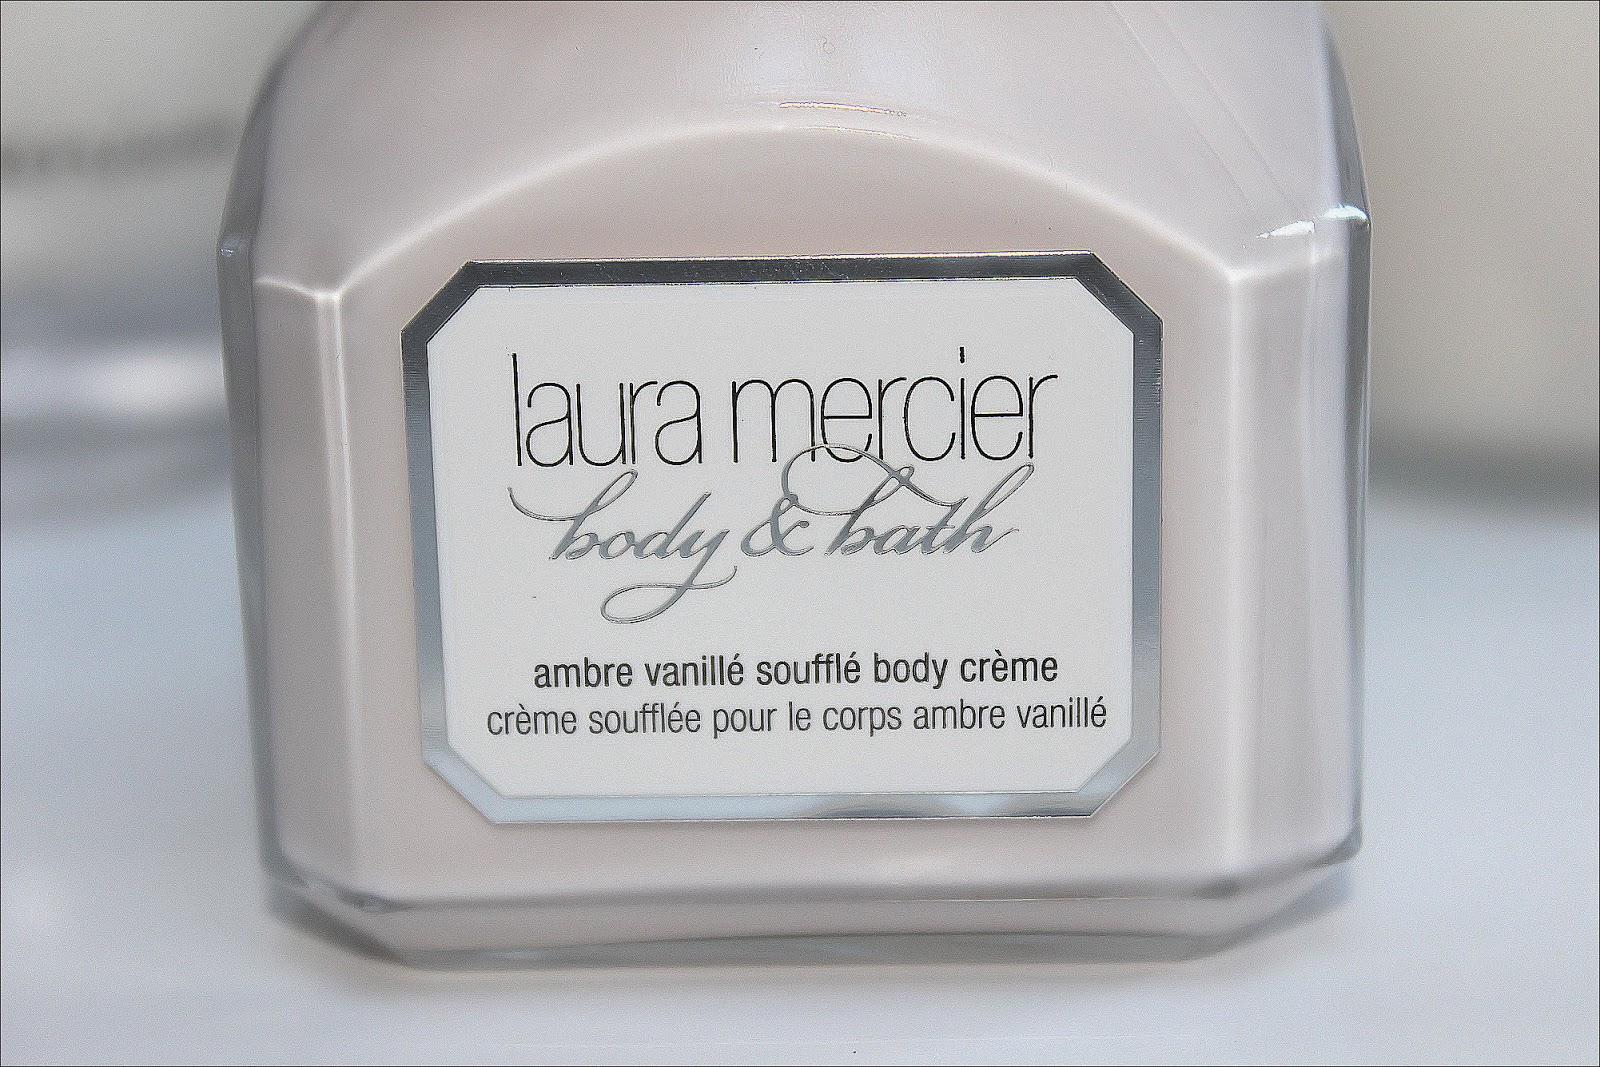 Laura Mercier Ambre Vanille Souffle Body Creme